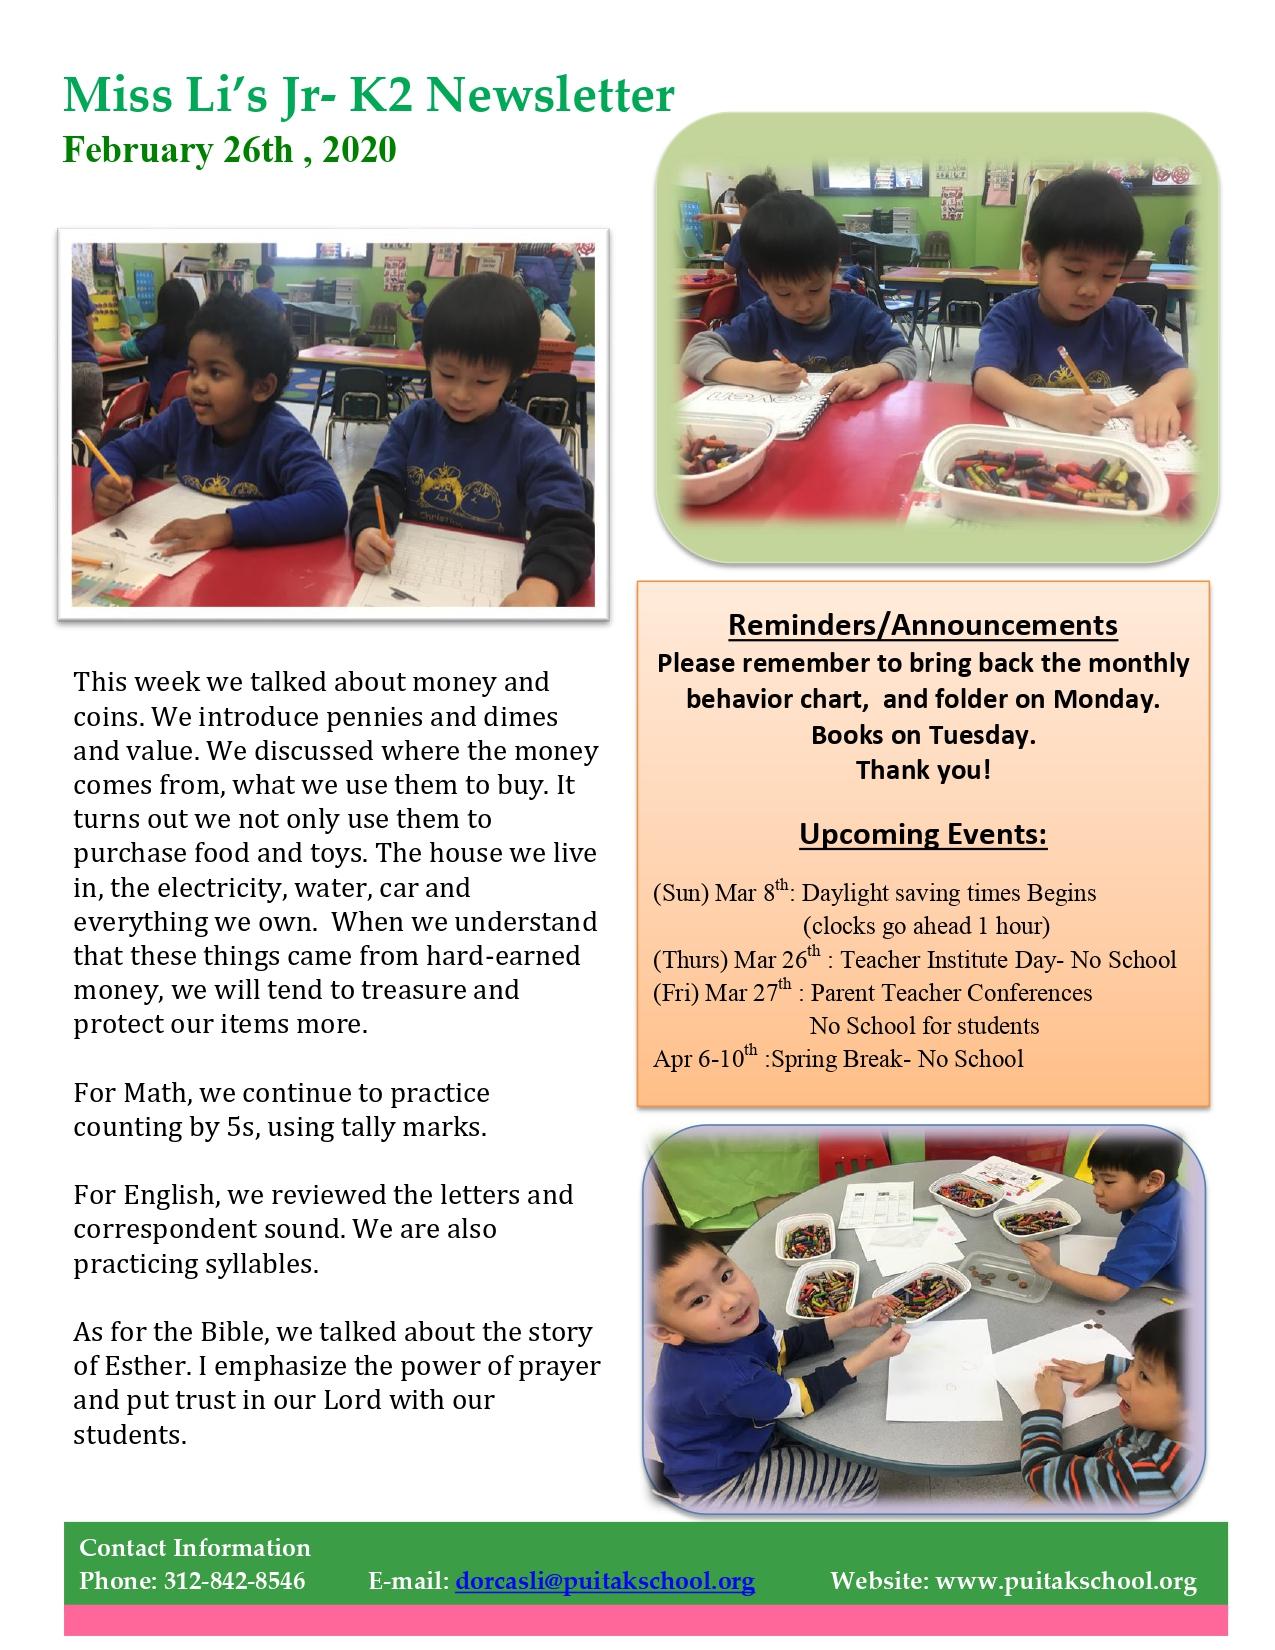 DorcasNewletter2020February4thweek_page-